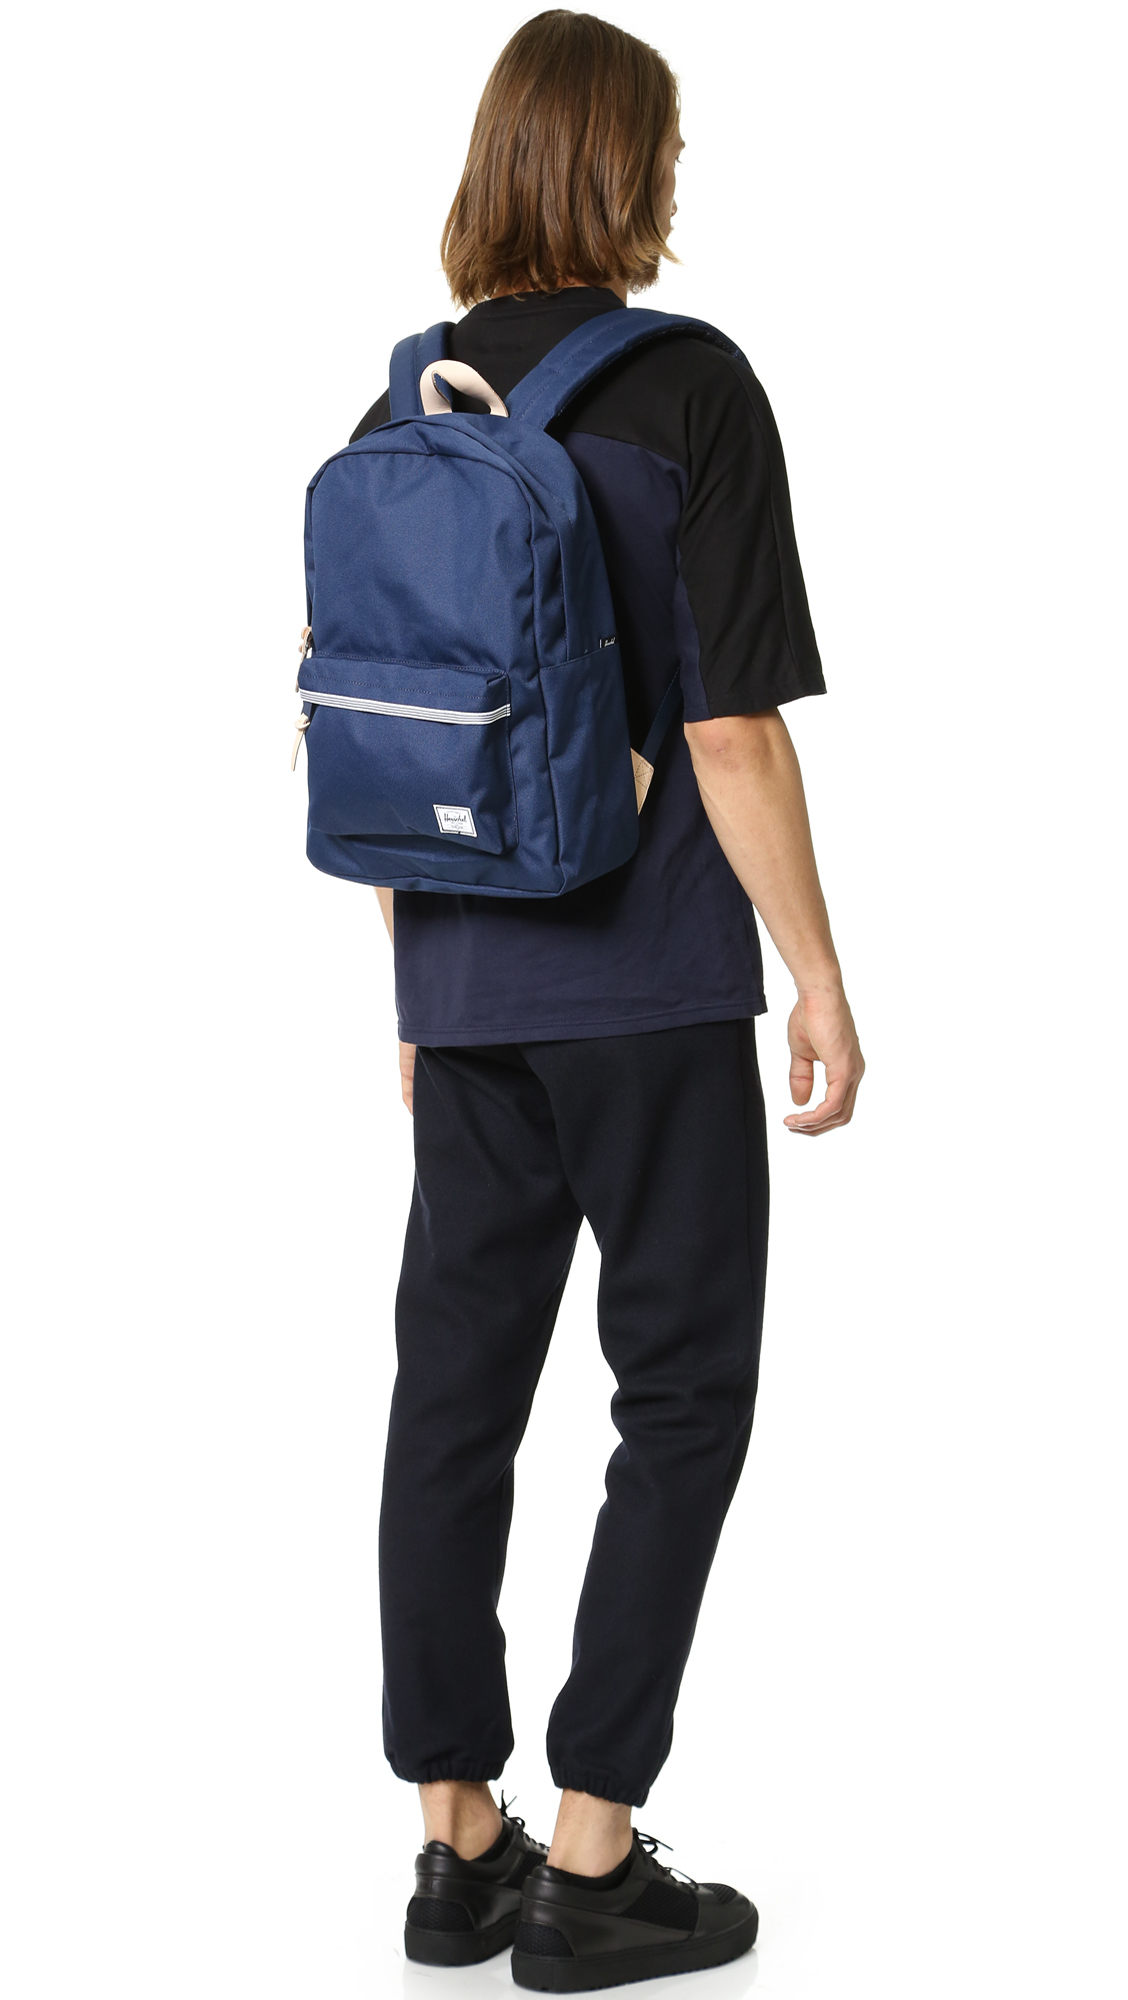 Herschel Supply Co. Synthetic Winlaw Backpack in Navy (Blue) for Men